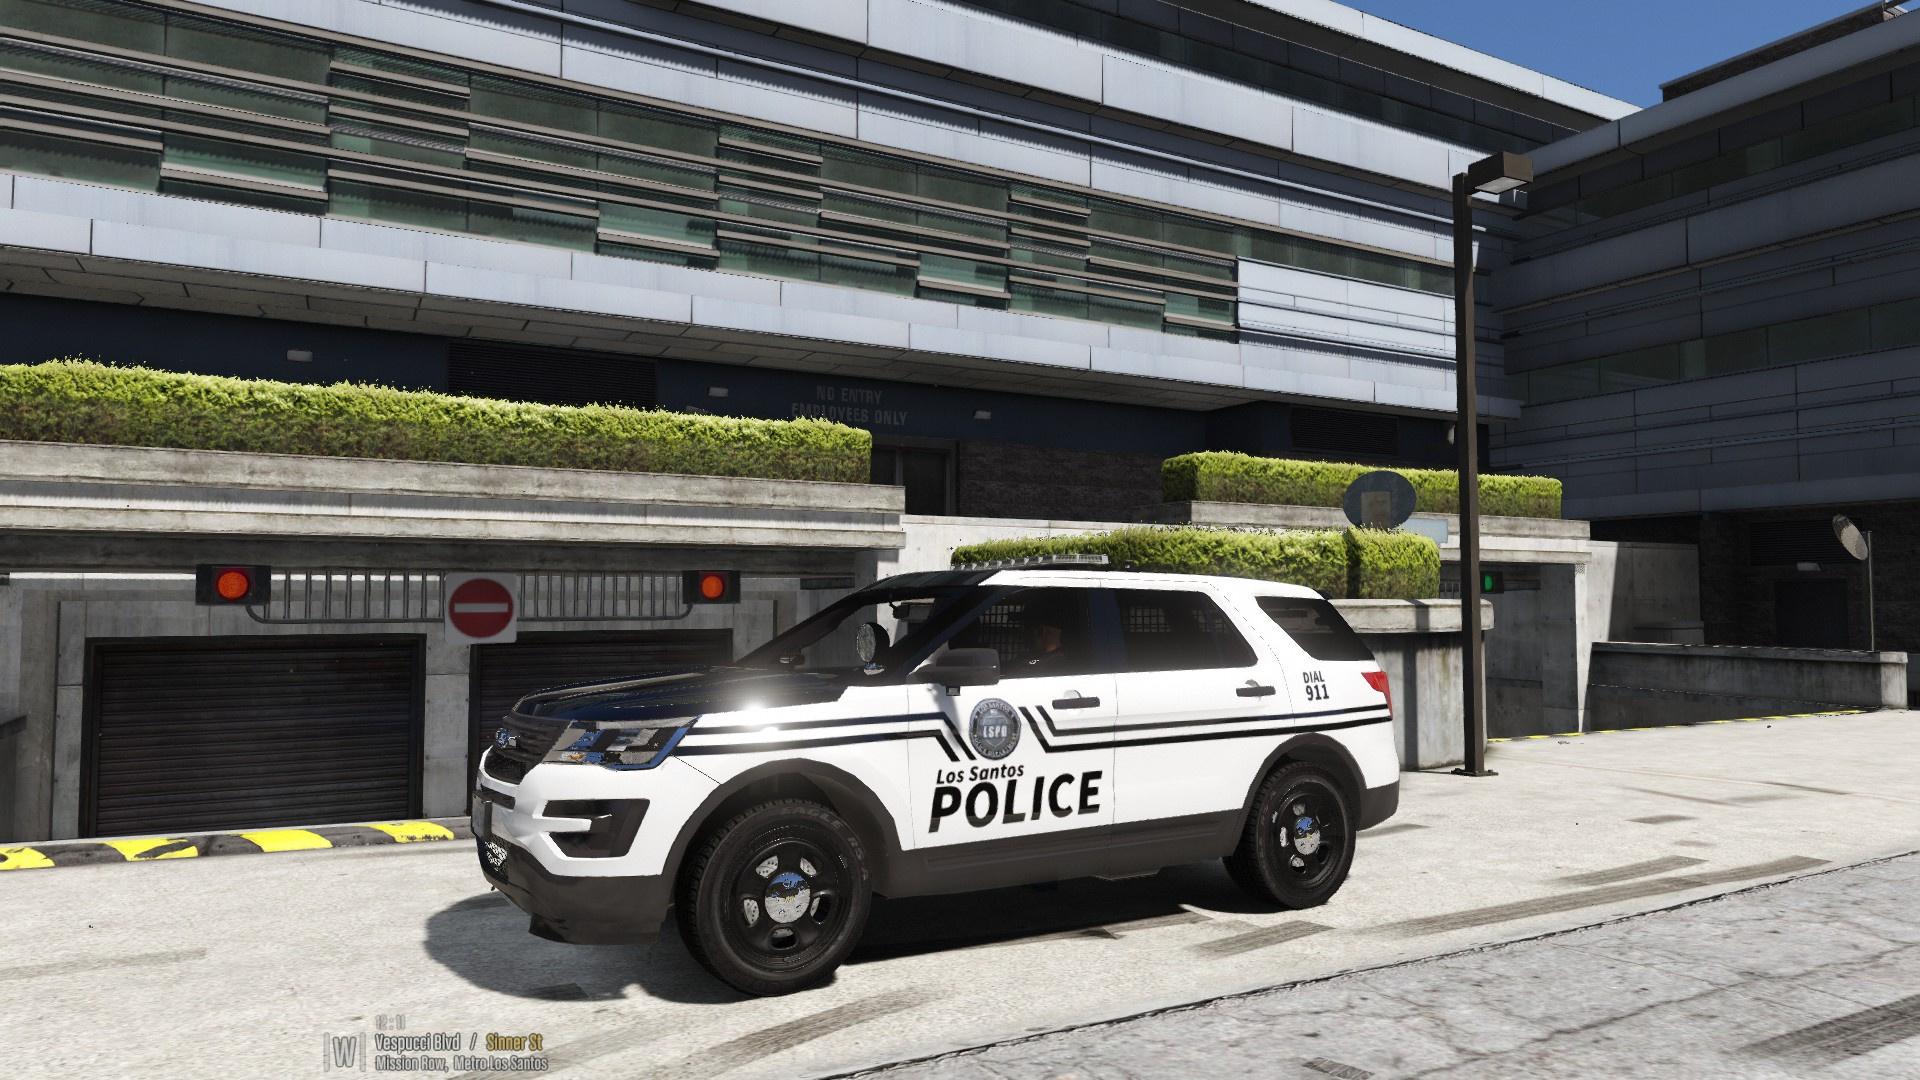 los santos police department gta5. Black Bedroom Furniture Sets. Home Design Ideas